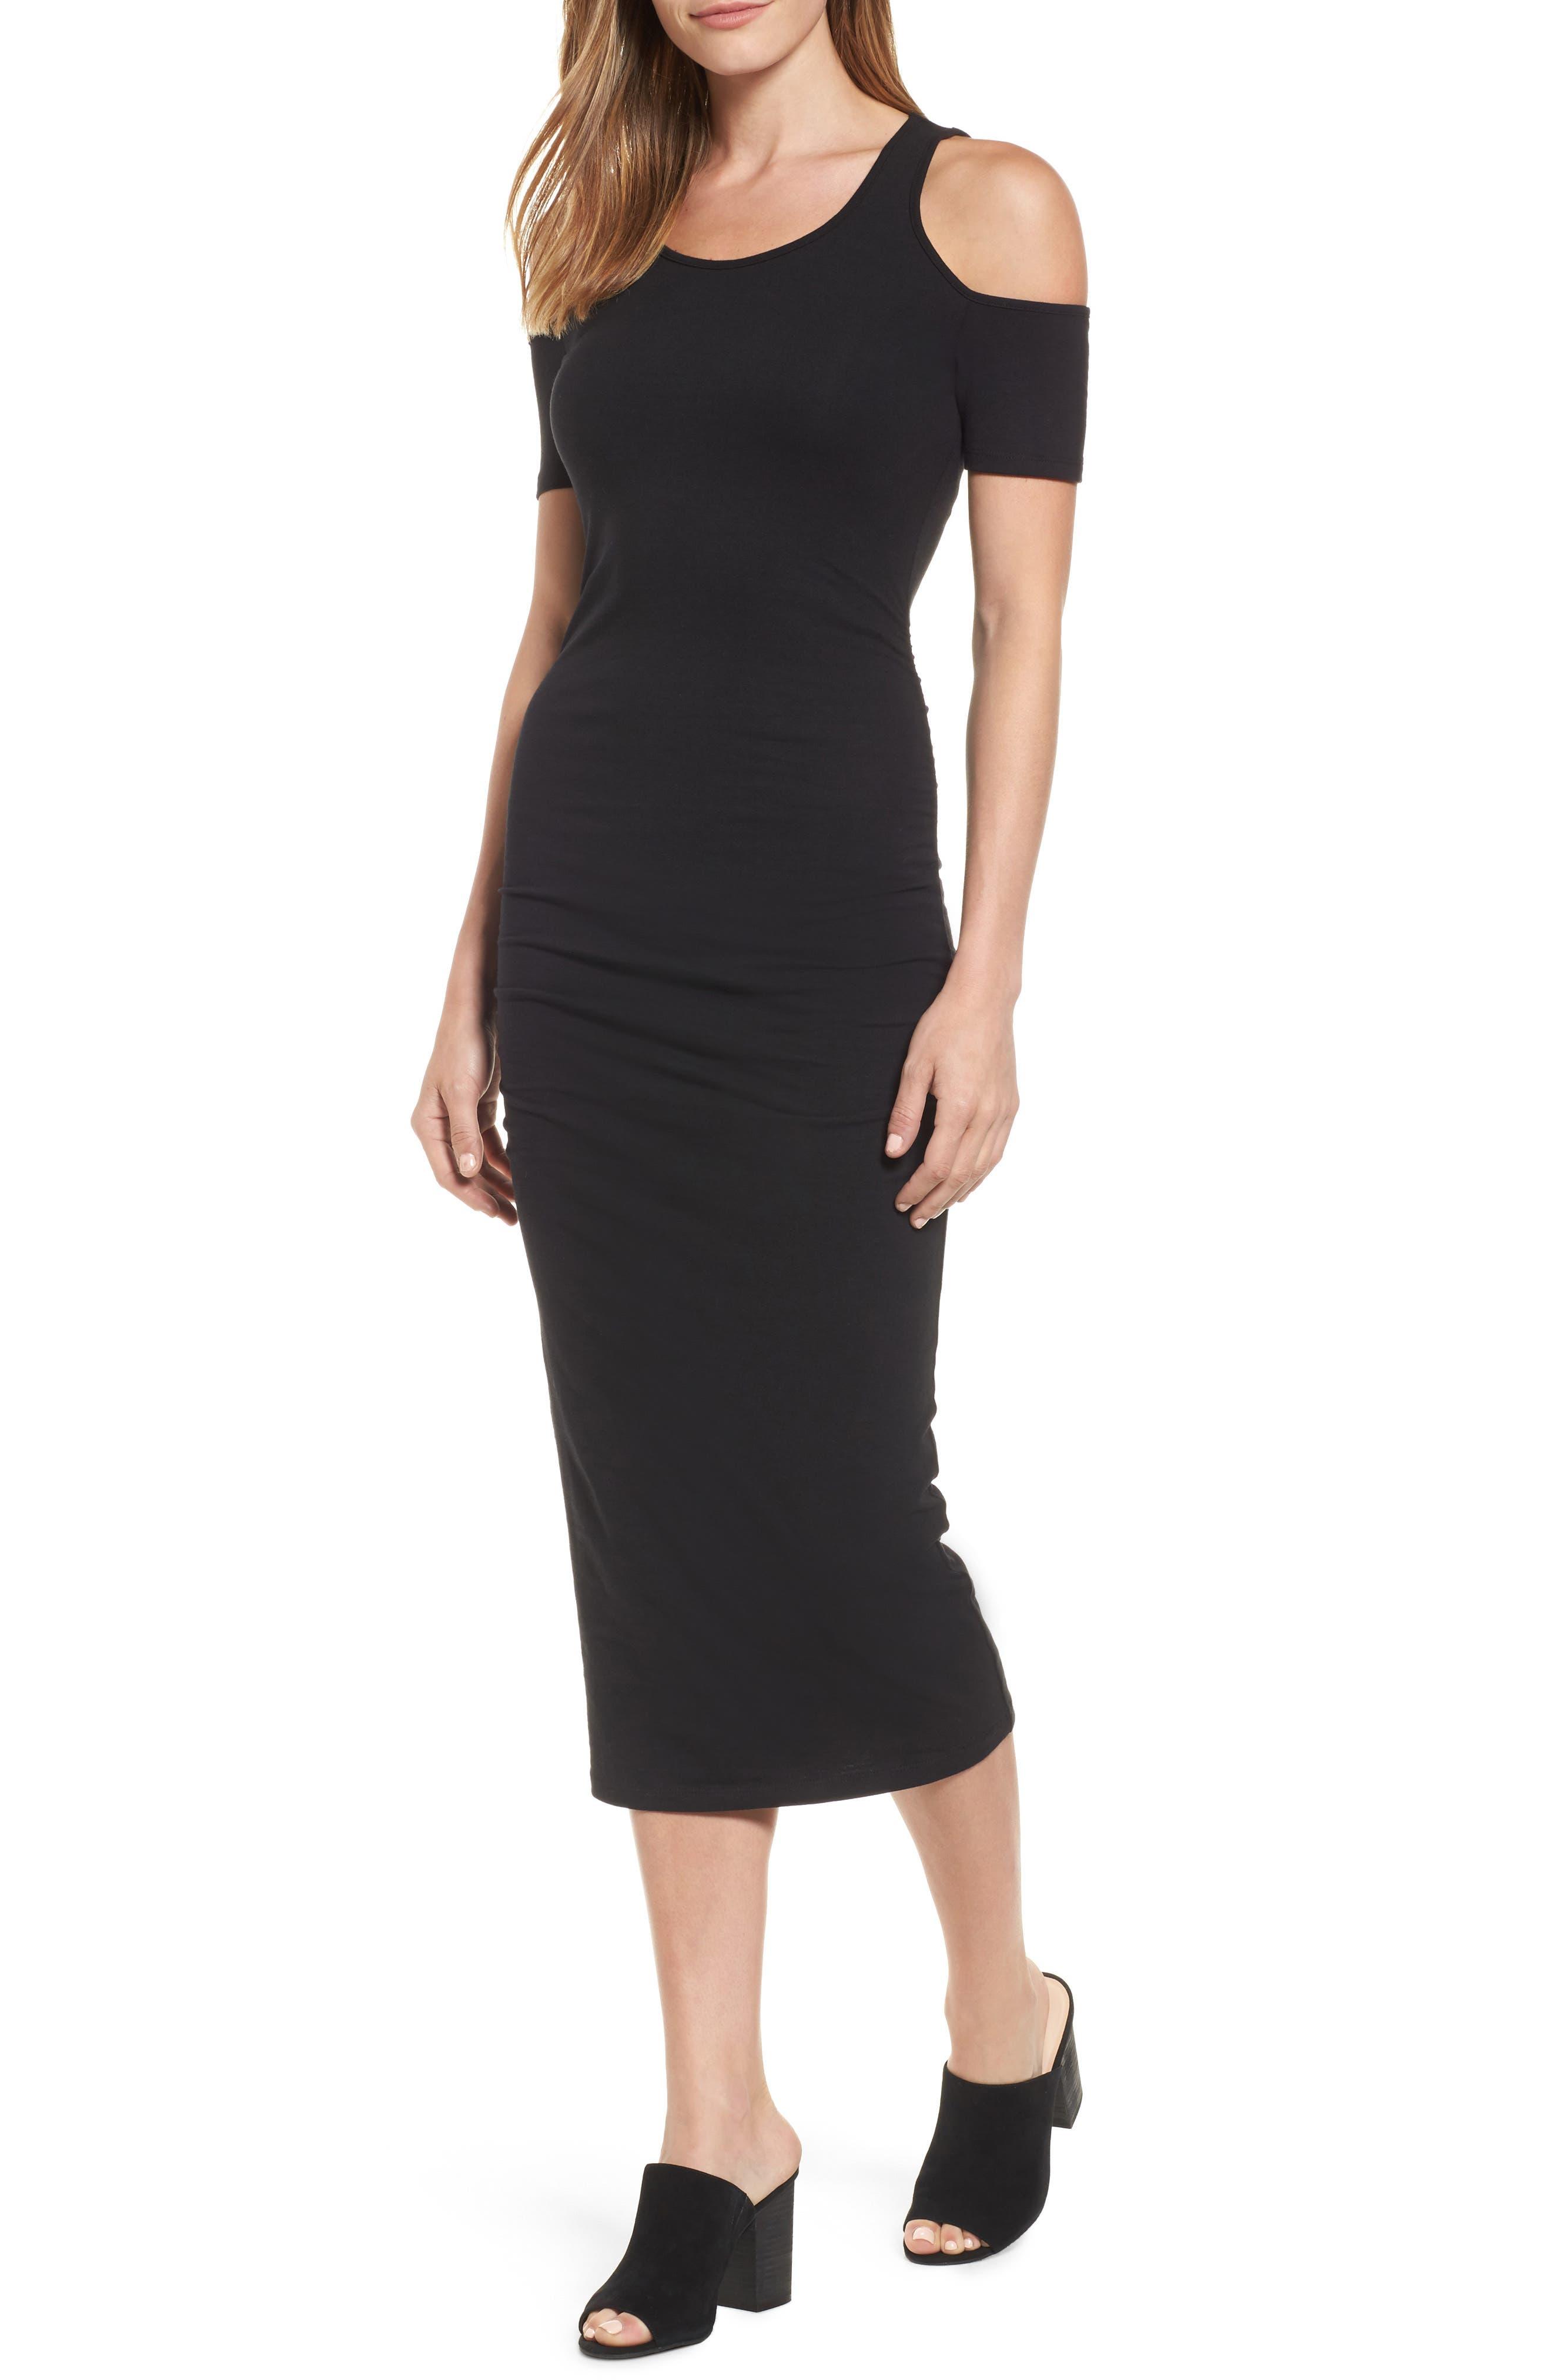 Petite Michael Stars Cold Shoulder Body-Con Dress, Black